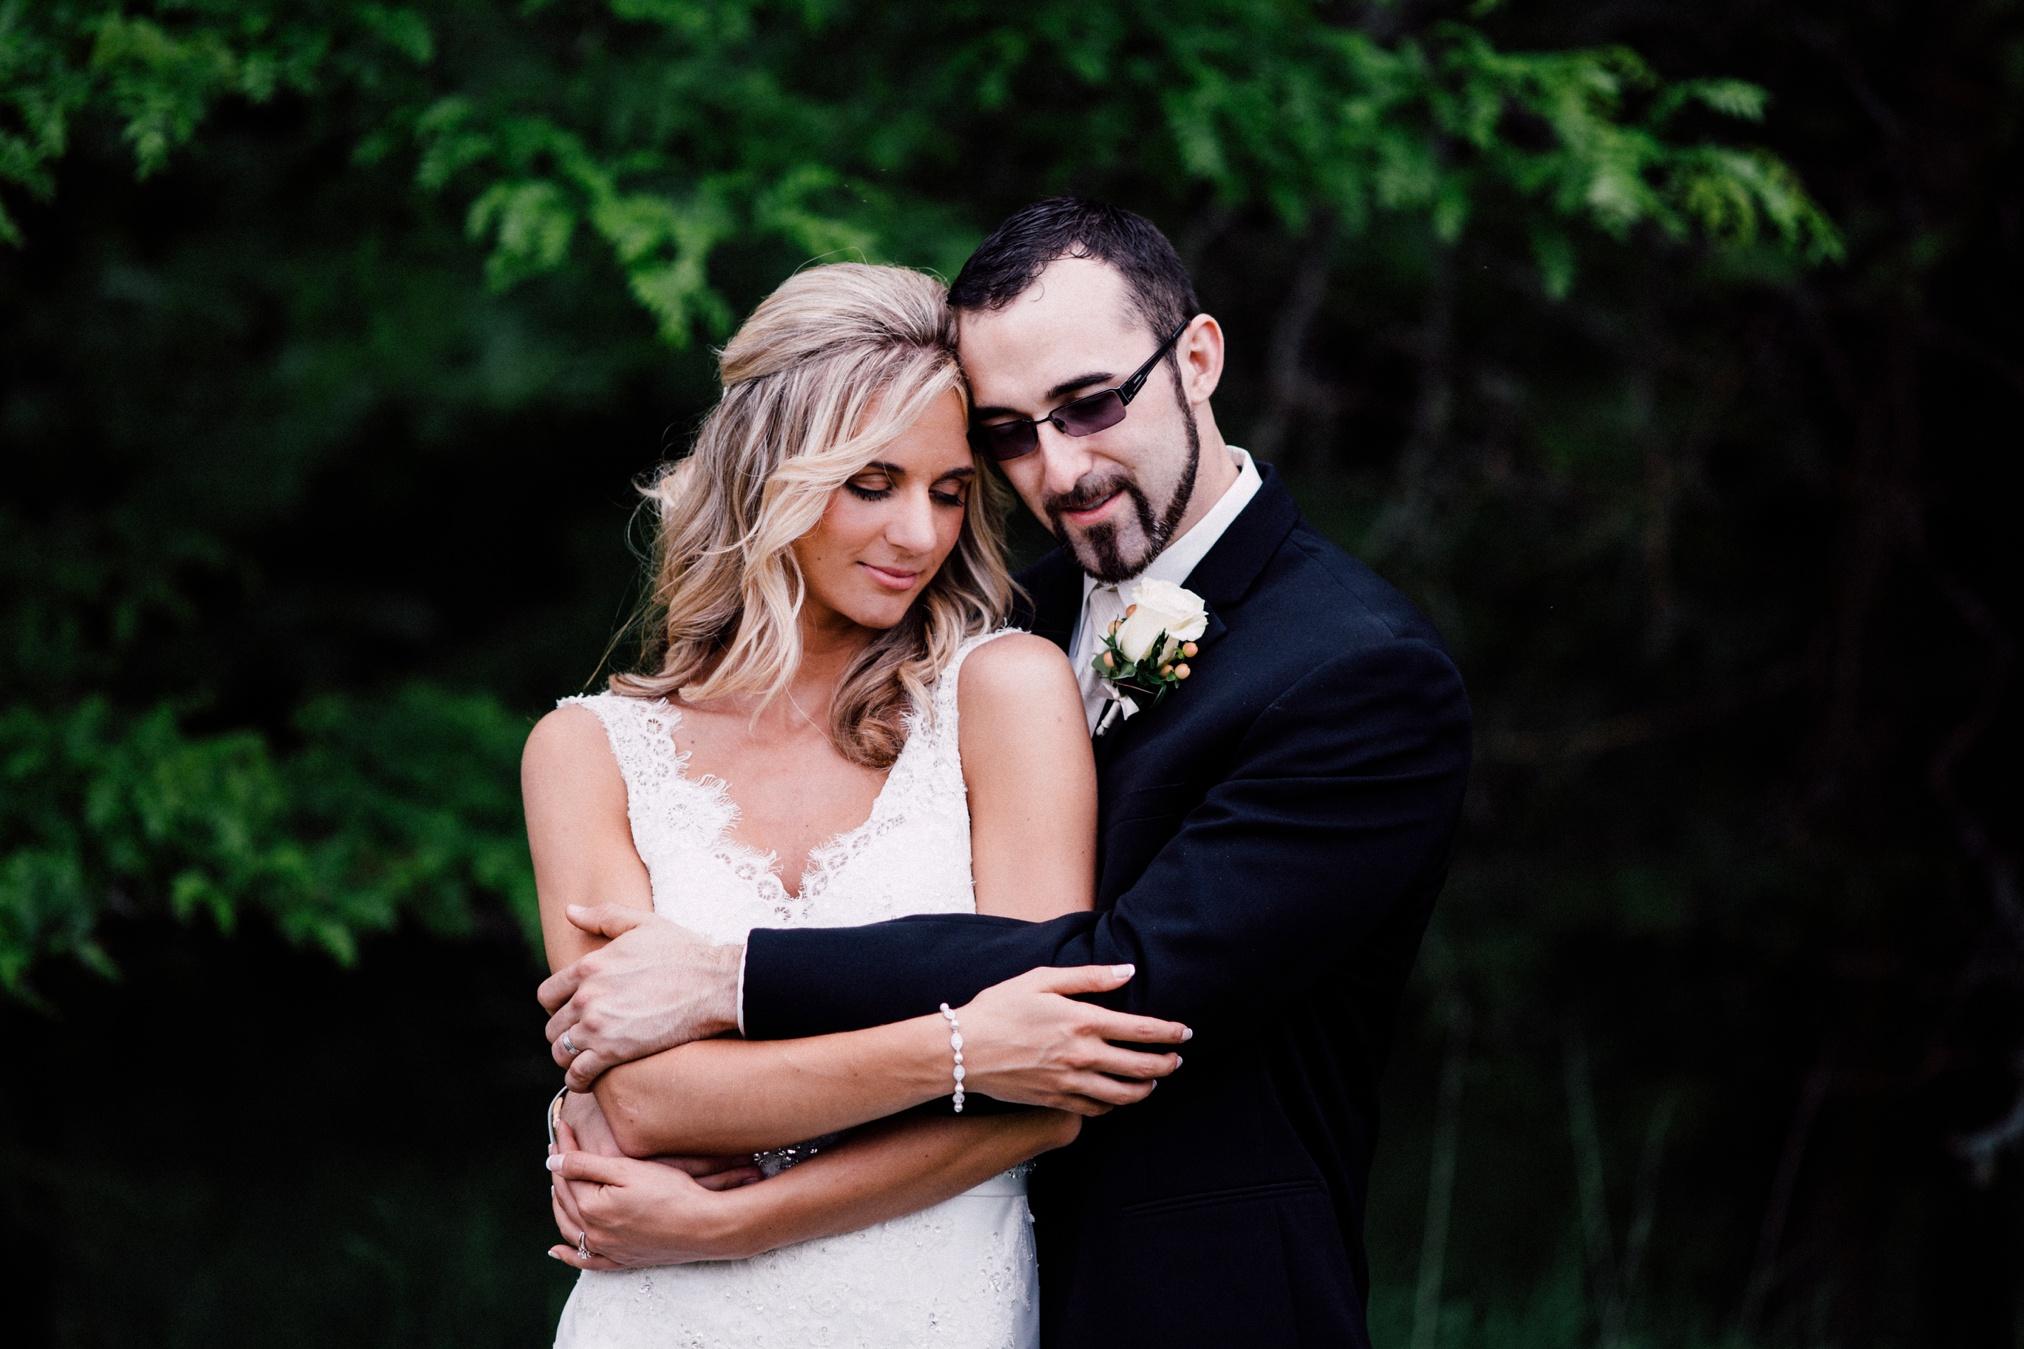 schmid_wedding-664.jpg